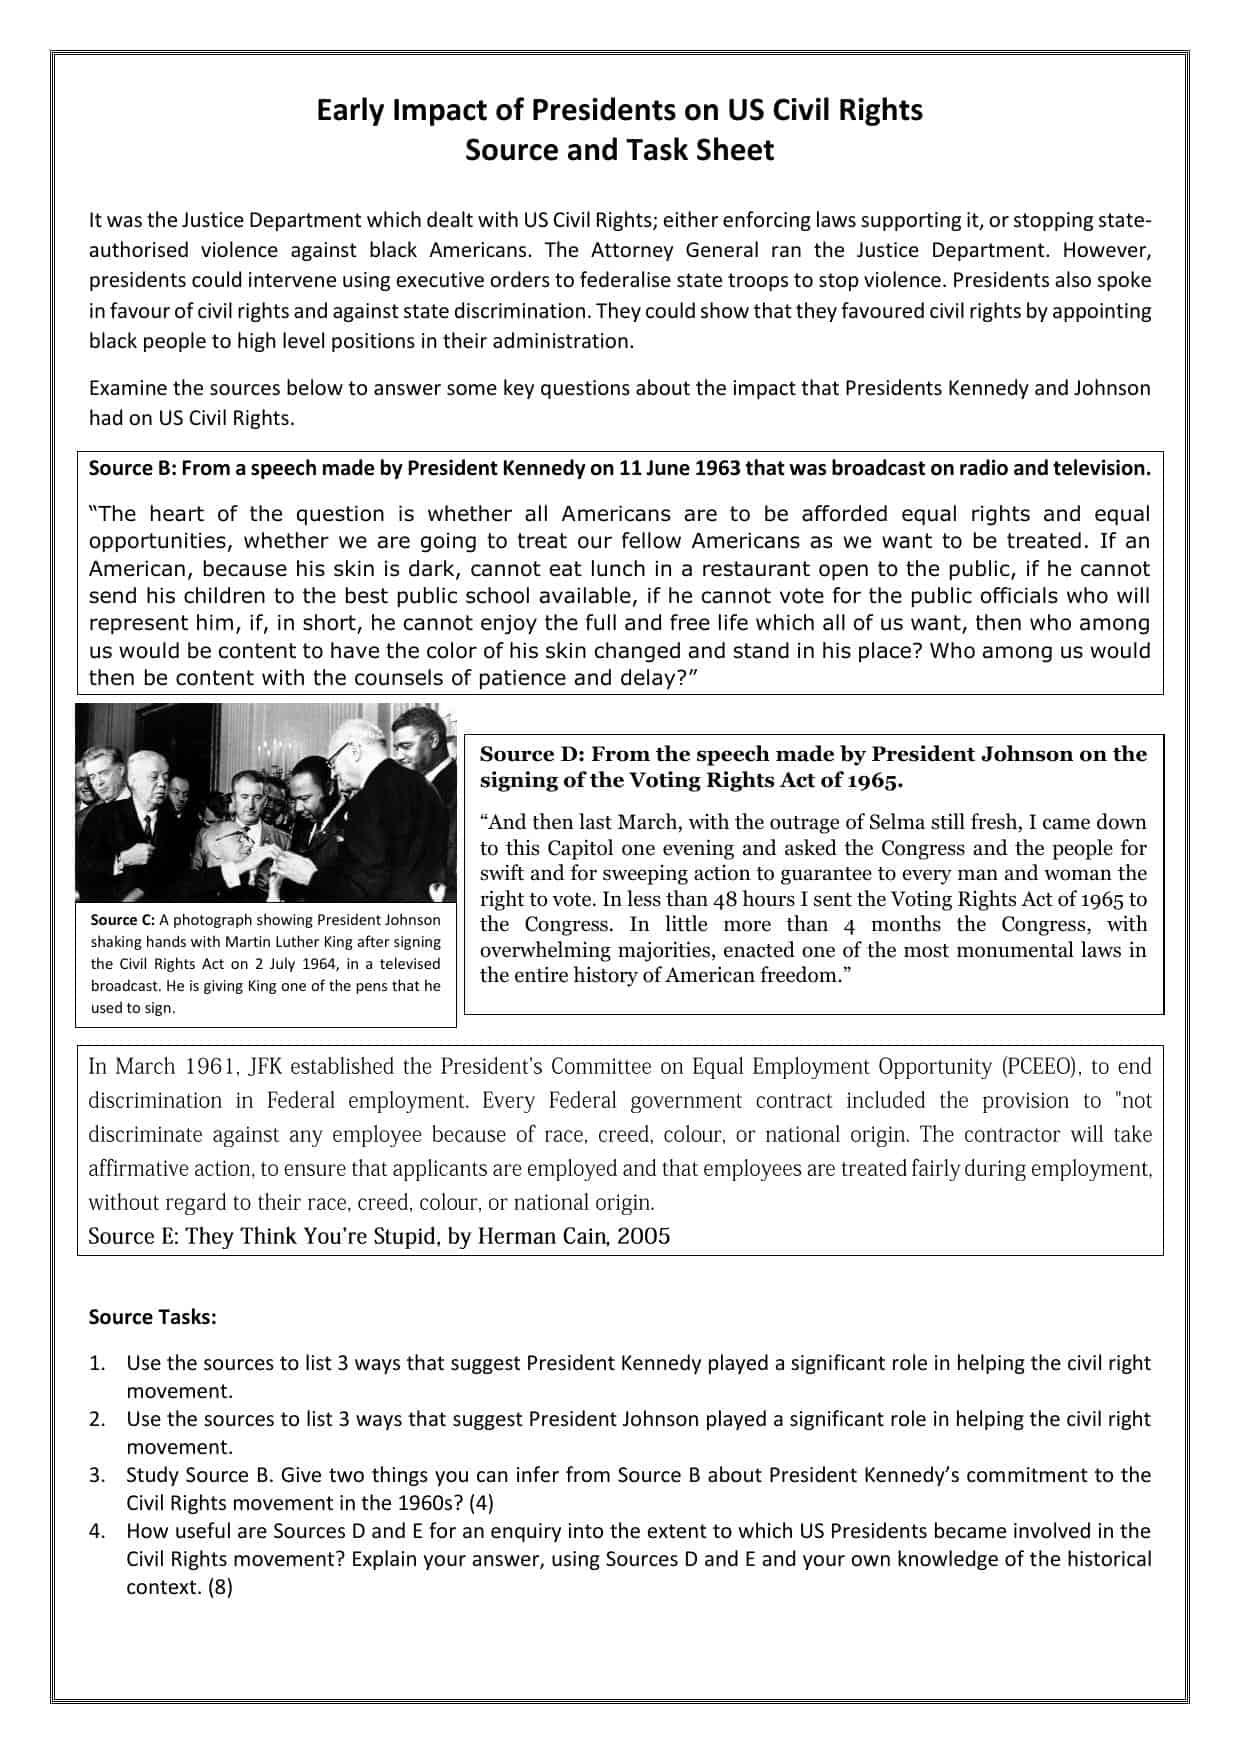 Us Civil Rights Edexcel Gcse Exam Source Questions